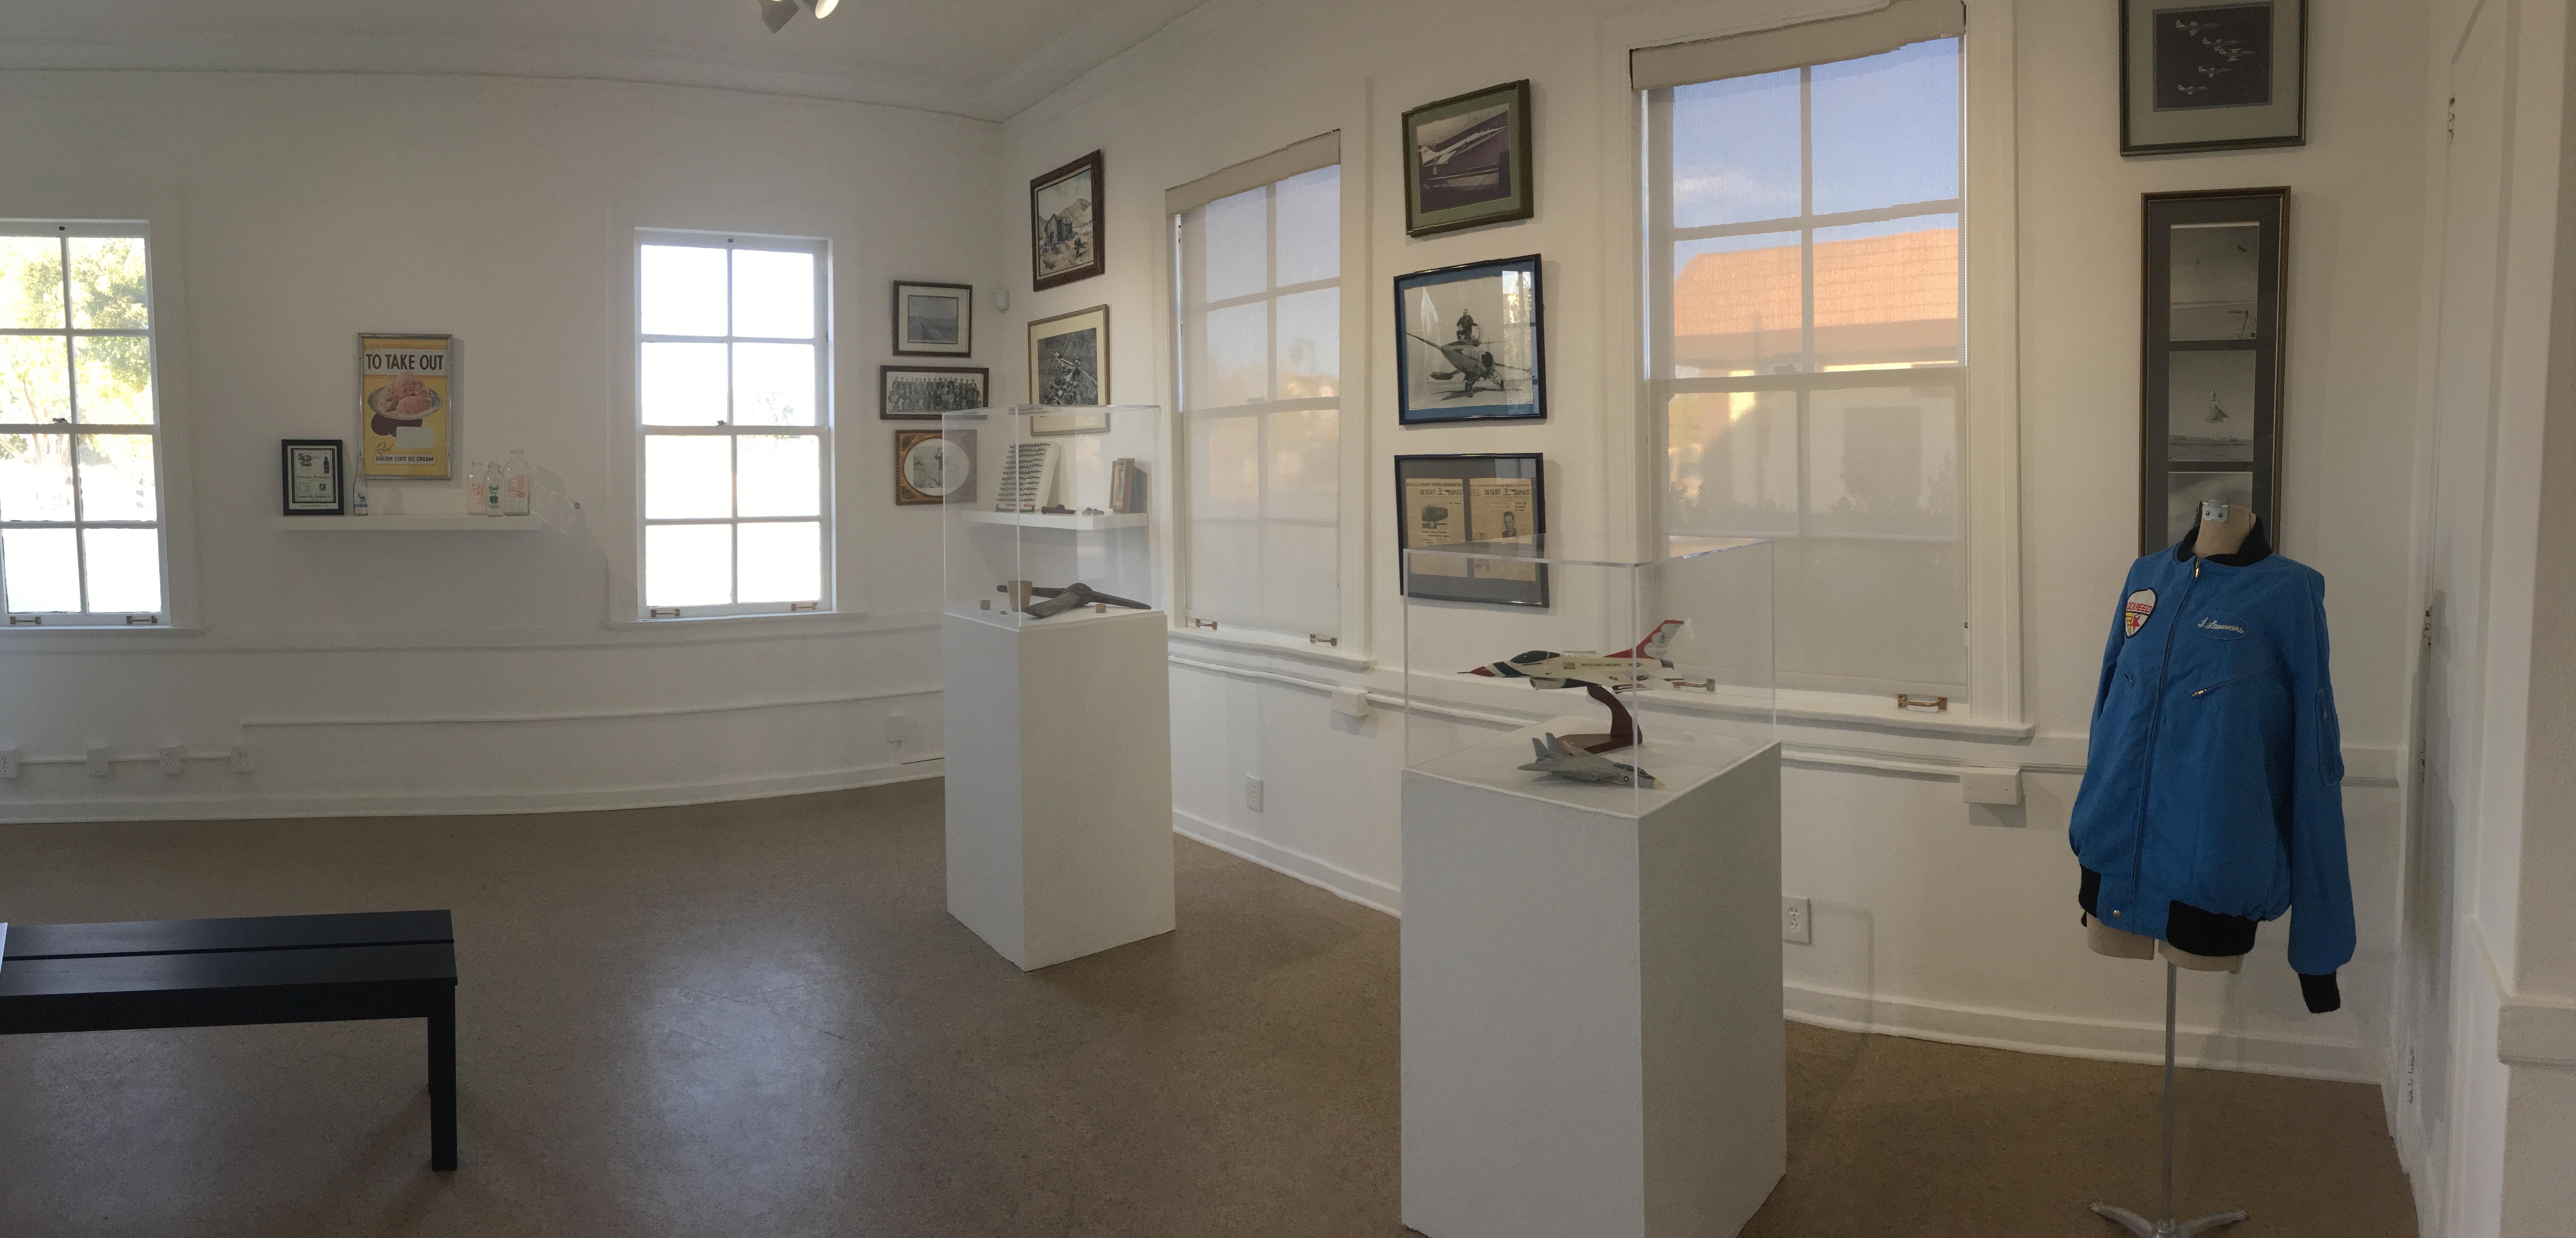 Celebrate Lancaster Exhibit Image 3